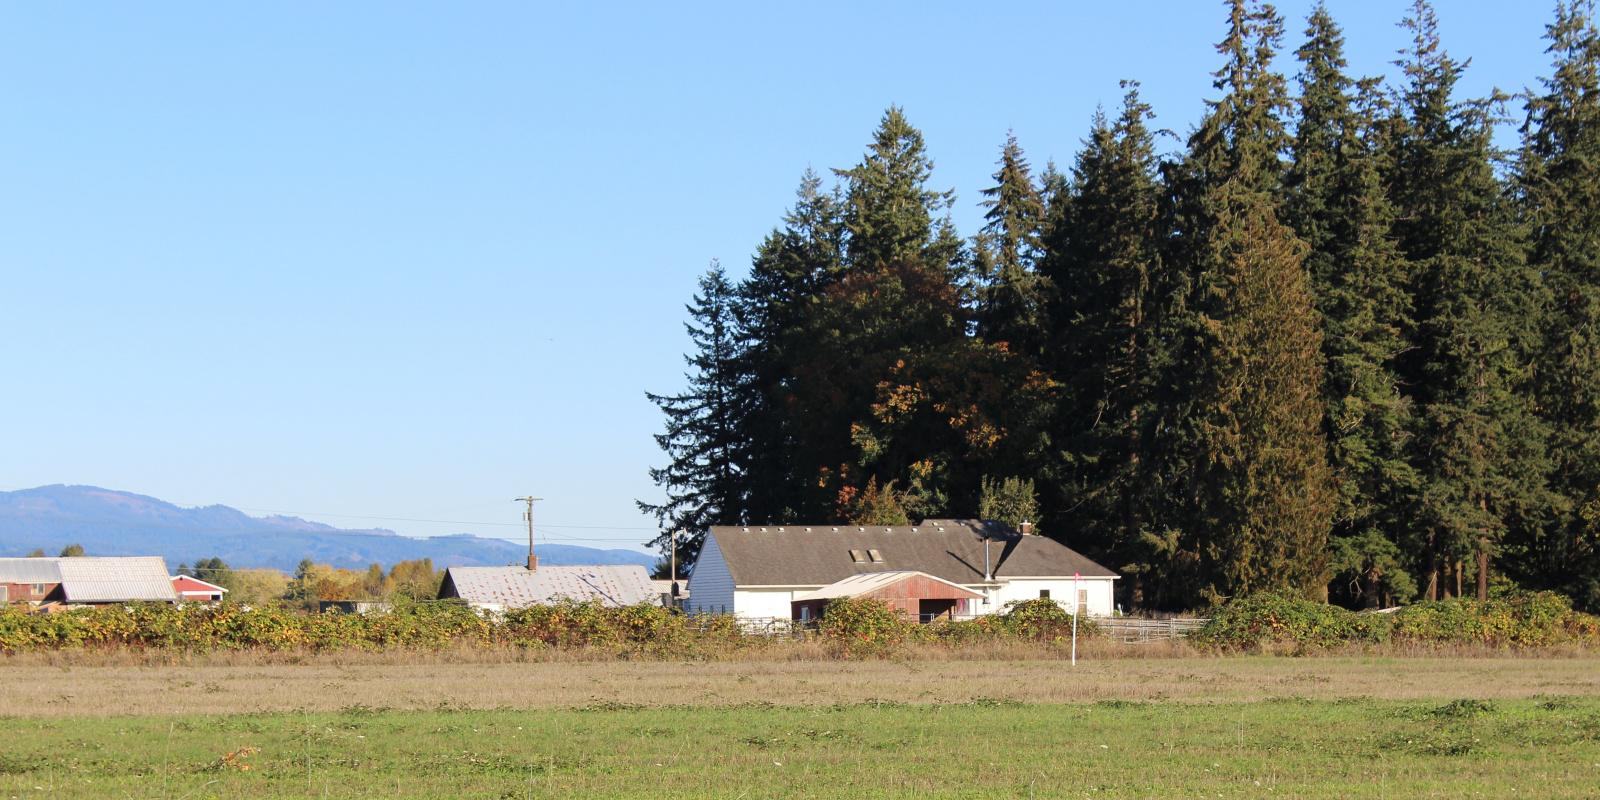 17026 NE 92nd Ave, Battleground, WA, ,Land,Sold/Leased,Valley Ranch Estates - Tract 2,17026 NE 92nd Ave, Battleground, WA,1075